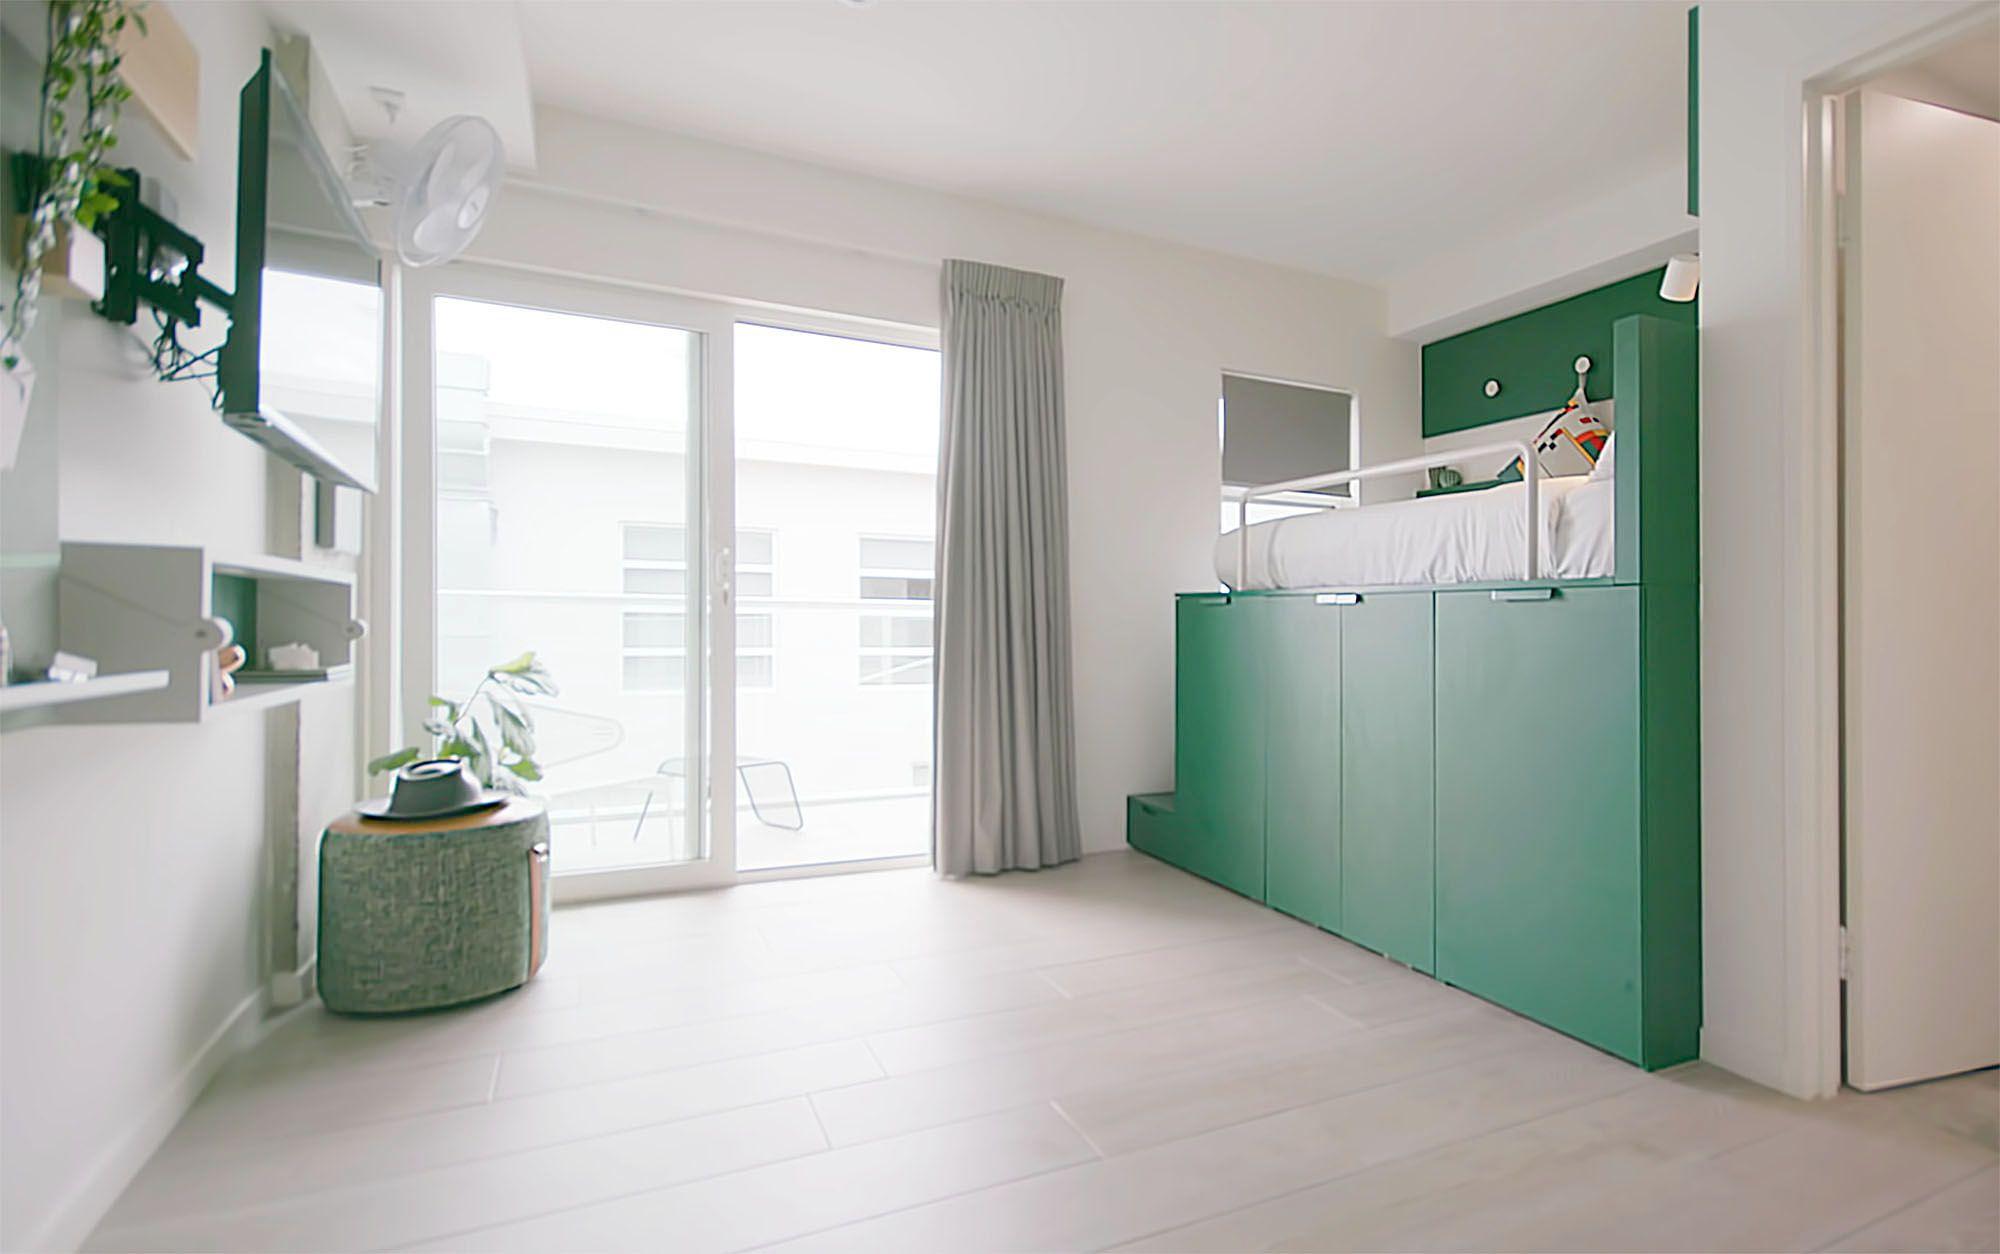 UKO stanmore coliving micro-apartment Mostaghim Associates interior